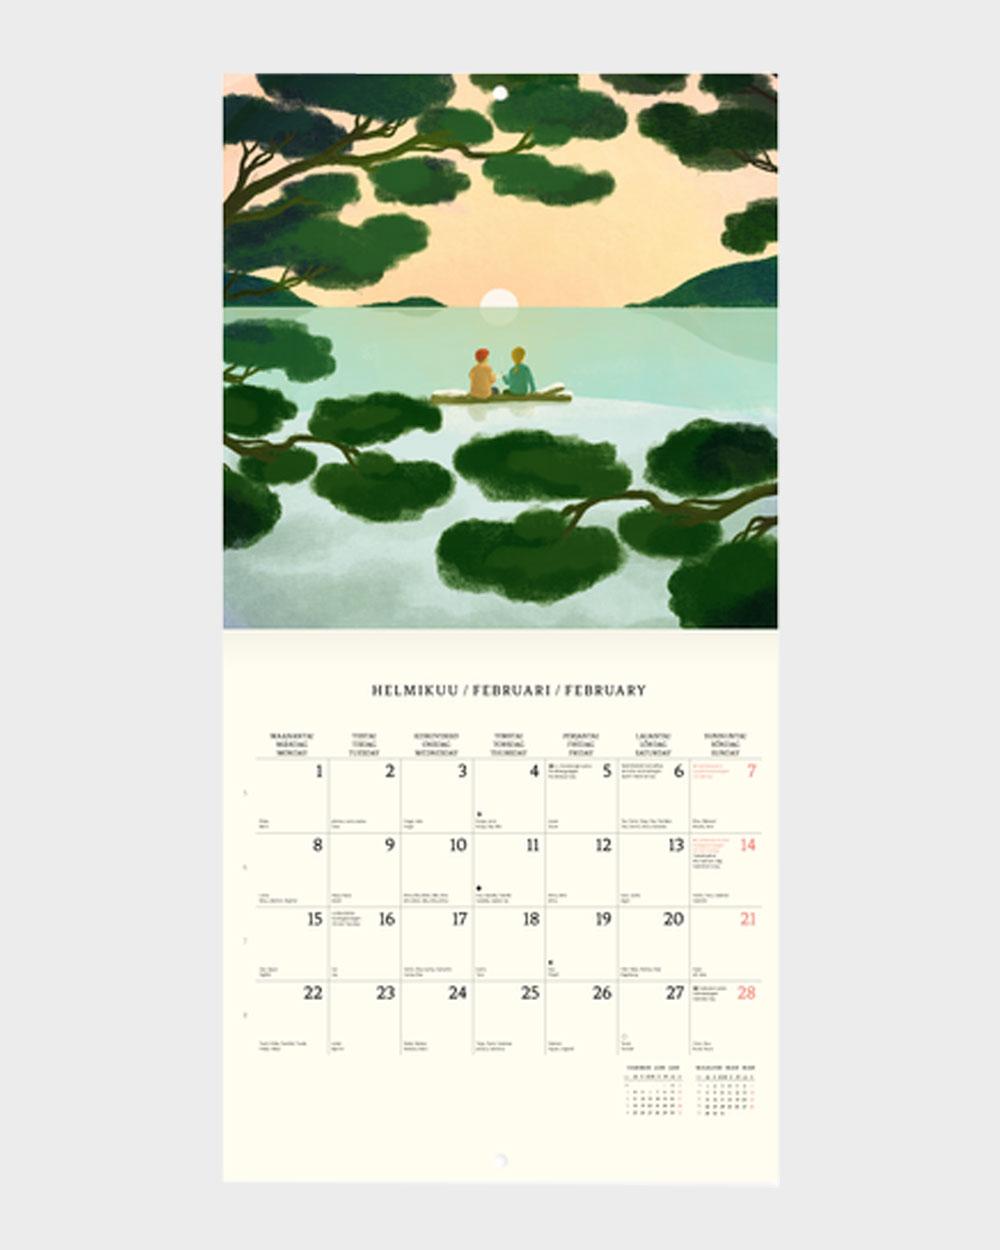 Polka Paper seinäkalenteri 2022 helmikuu